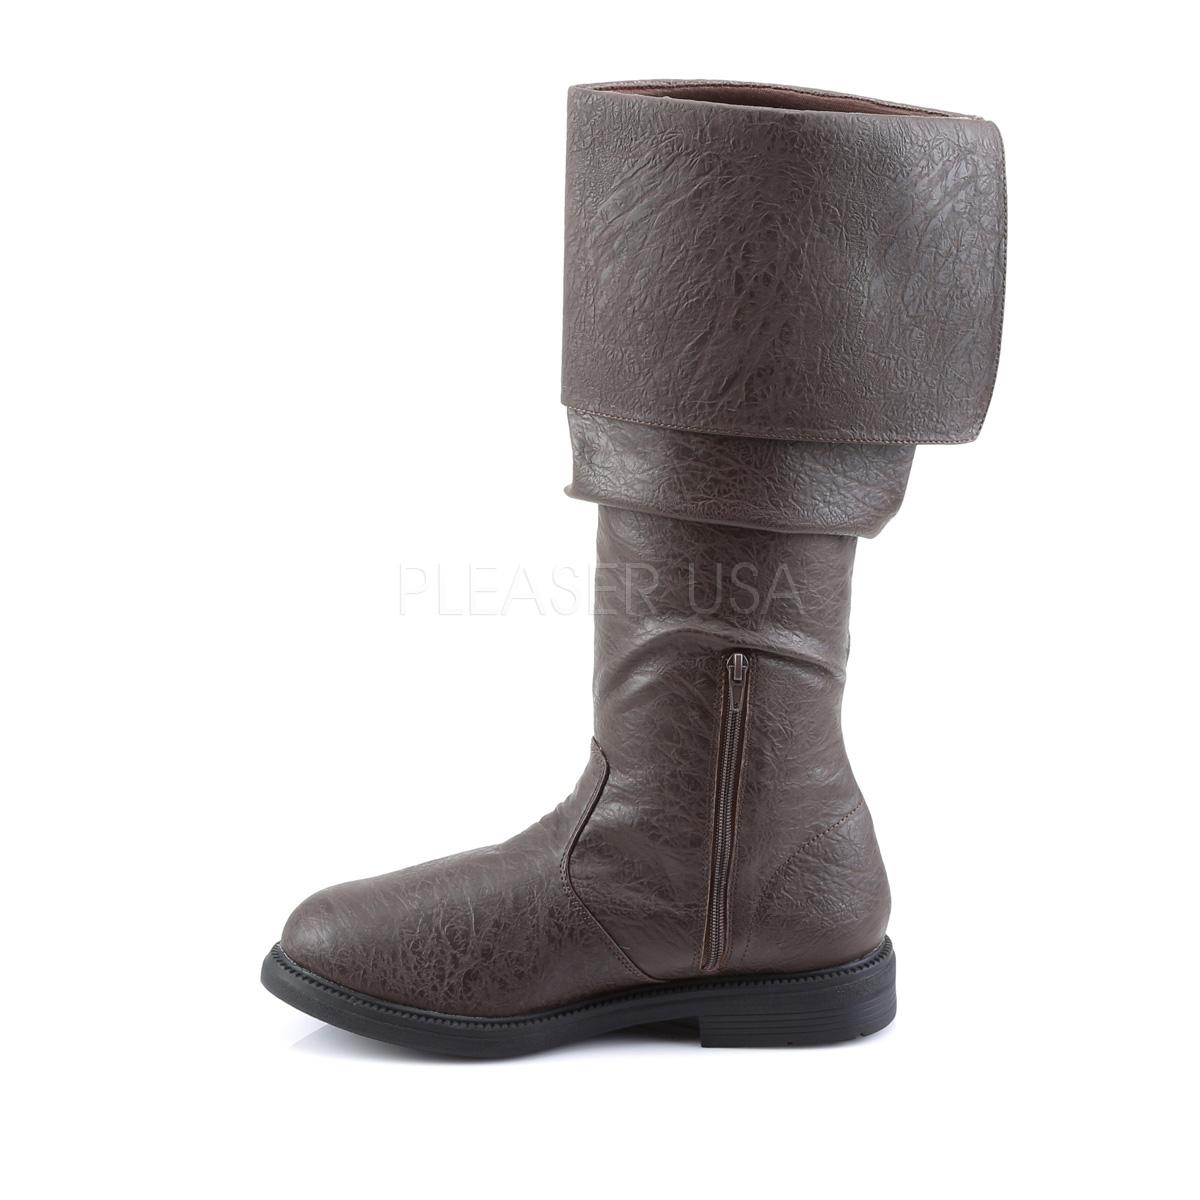 FUNTASMA ROBINHOOD-100 #Men's メンズブーツ  折り返しブーツ ブラウン 茶 Pleaser◆取り寄せ